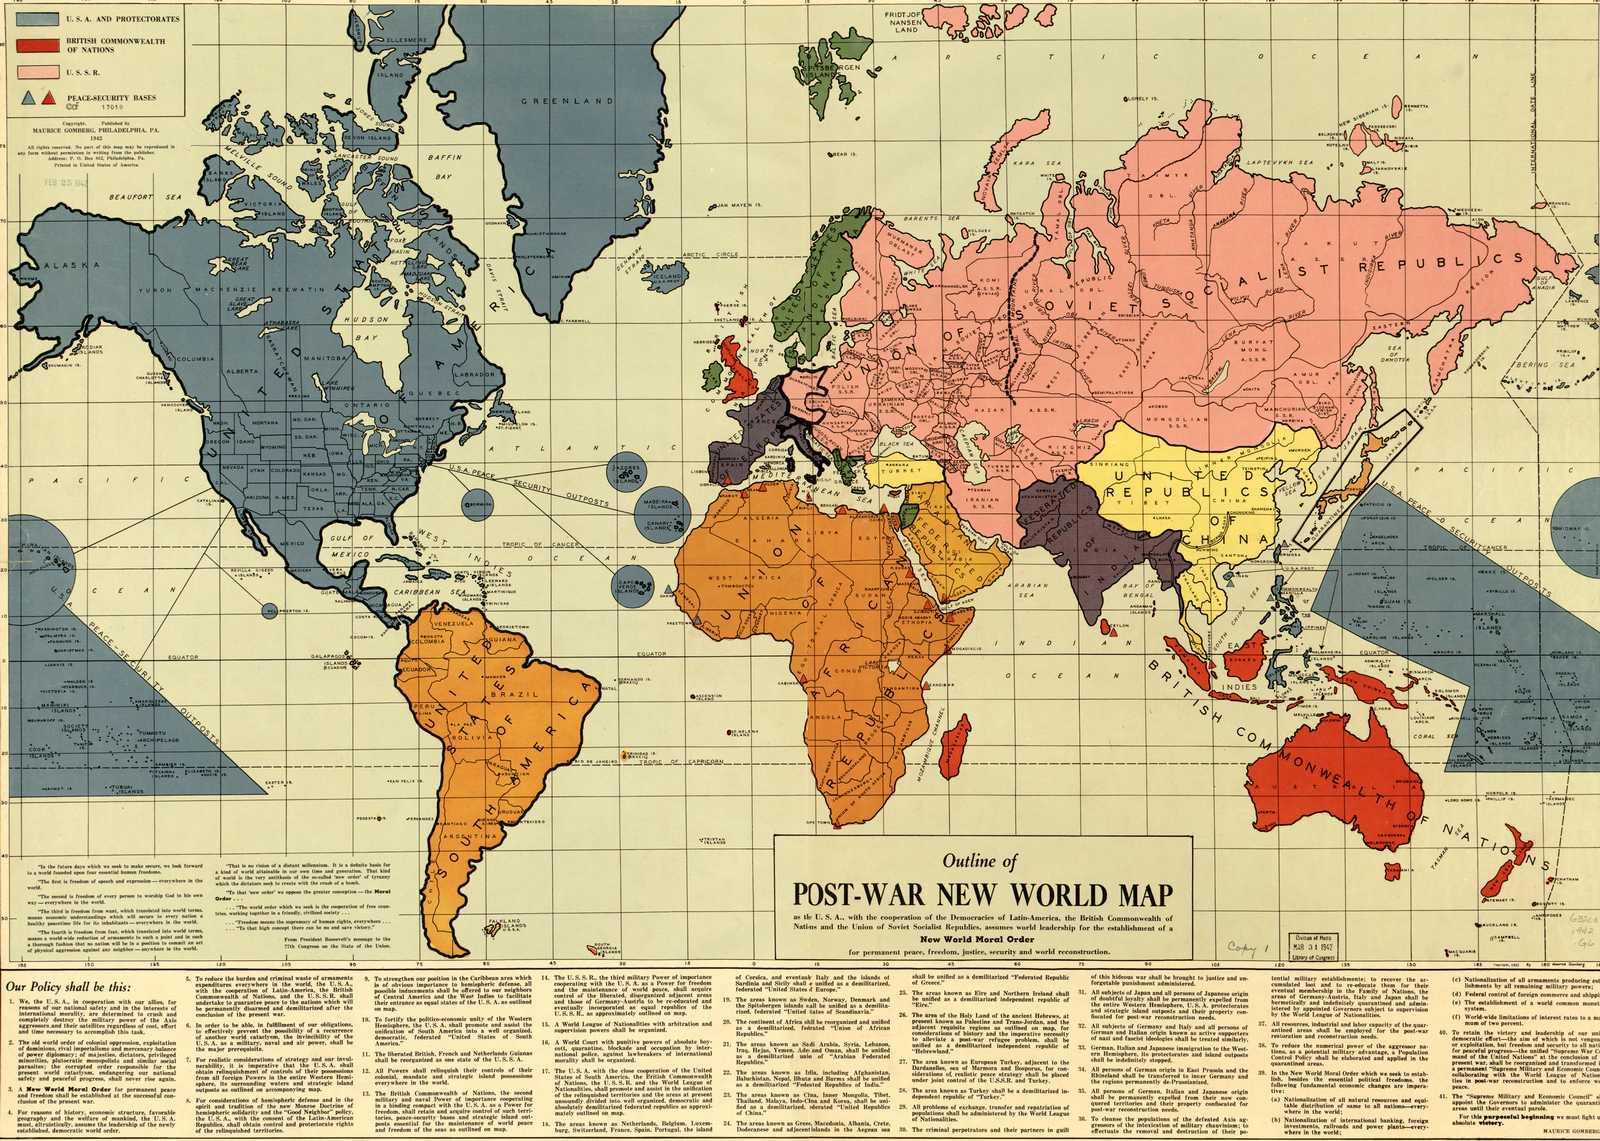 21st Century British Nationalism: WW2 and the New World Order